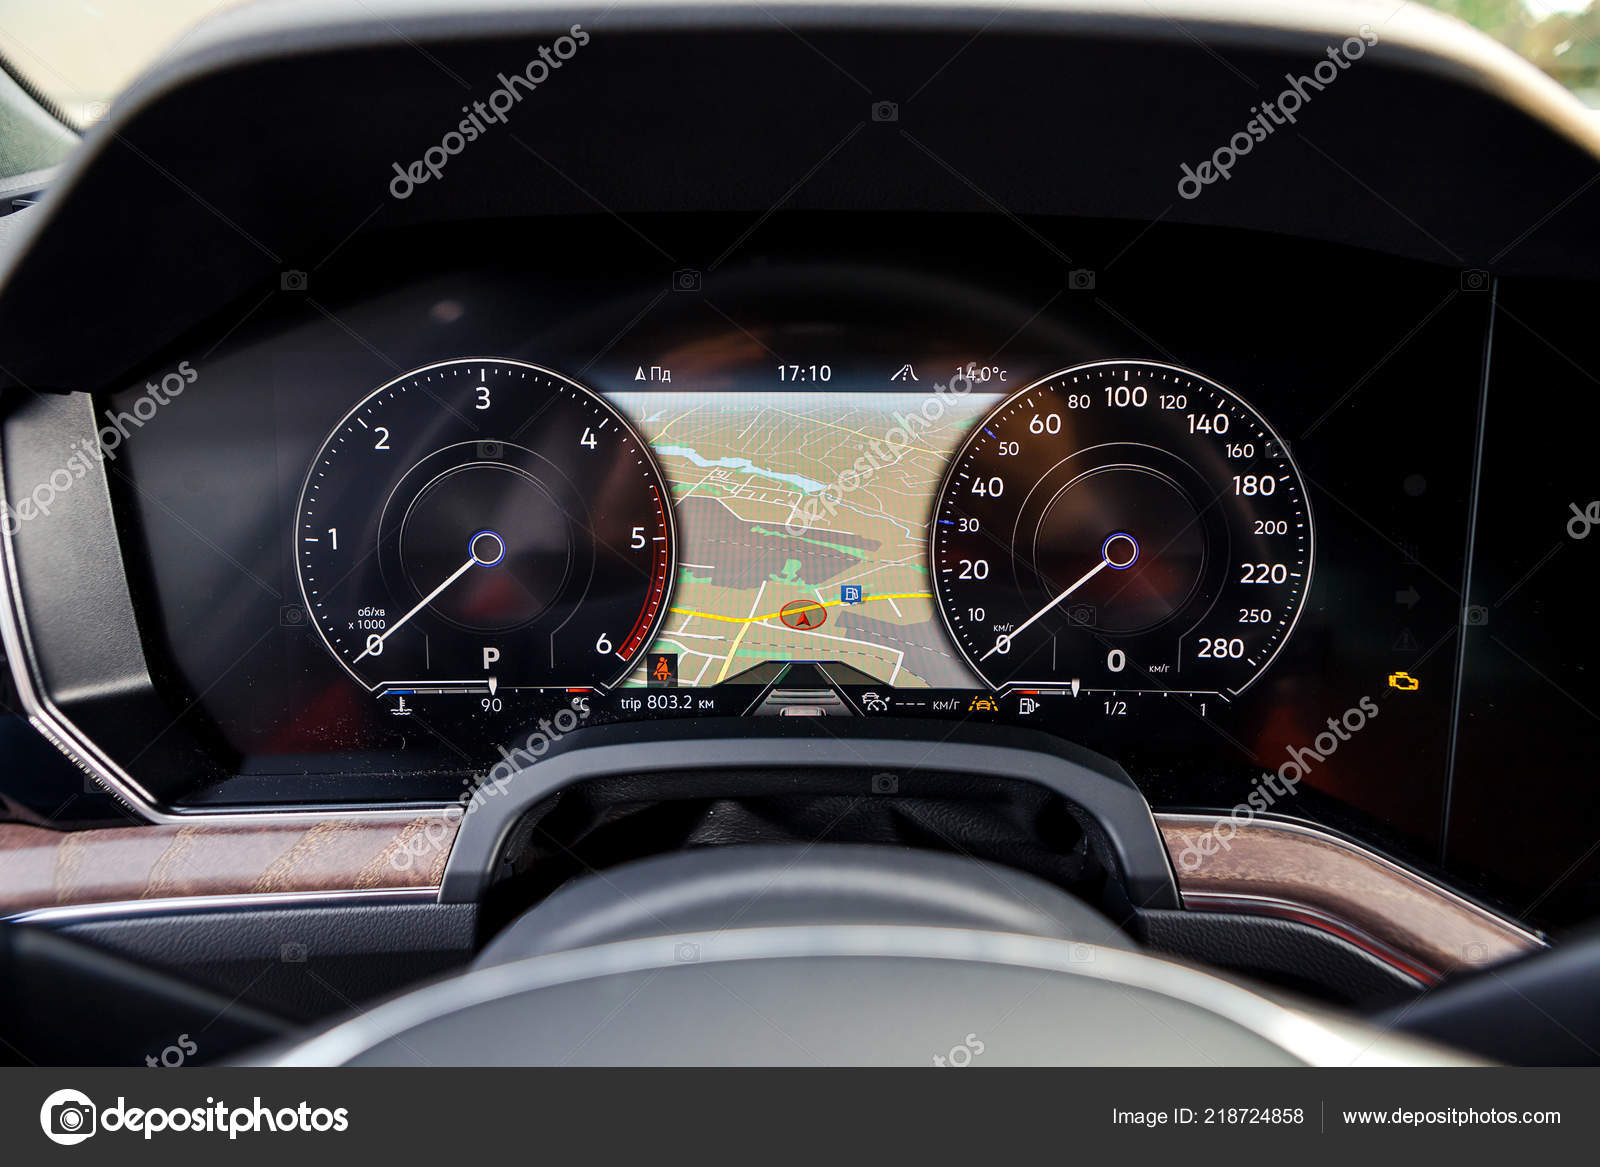 Outubro 2018 Vinnitsa Ucrania Nova Apresentacao Volkswagen Touareg Showroom Interior Fotografia De Stock Editorial C Bondvit 218724858